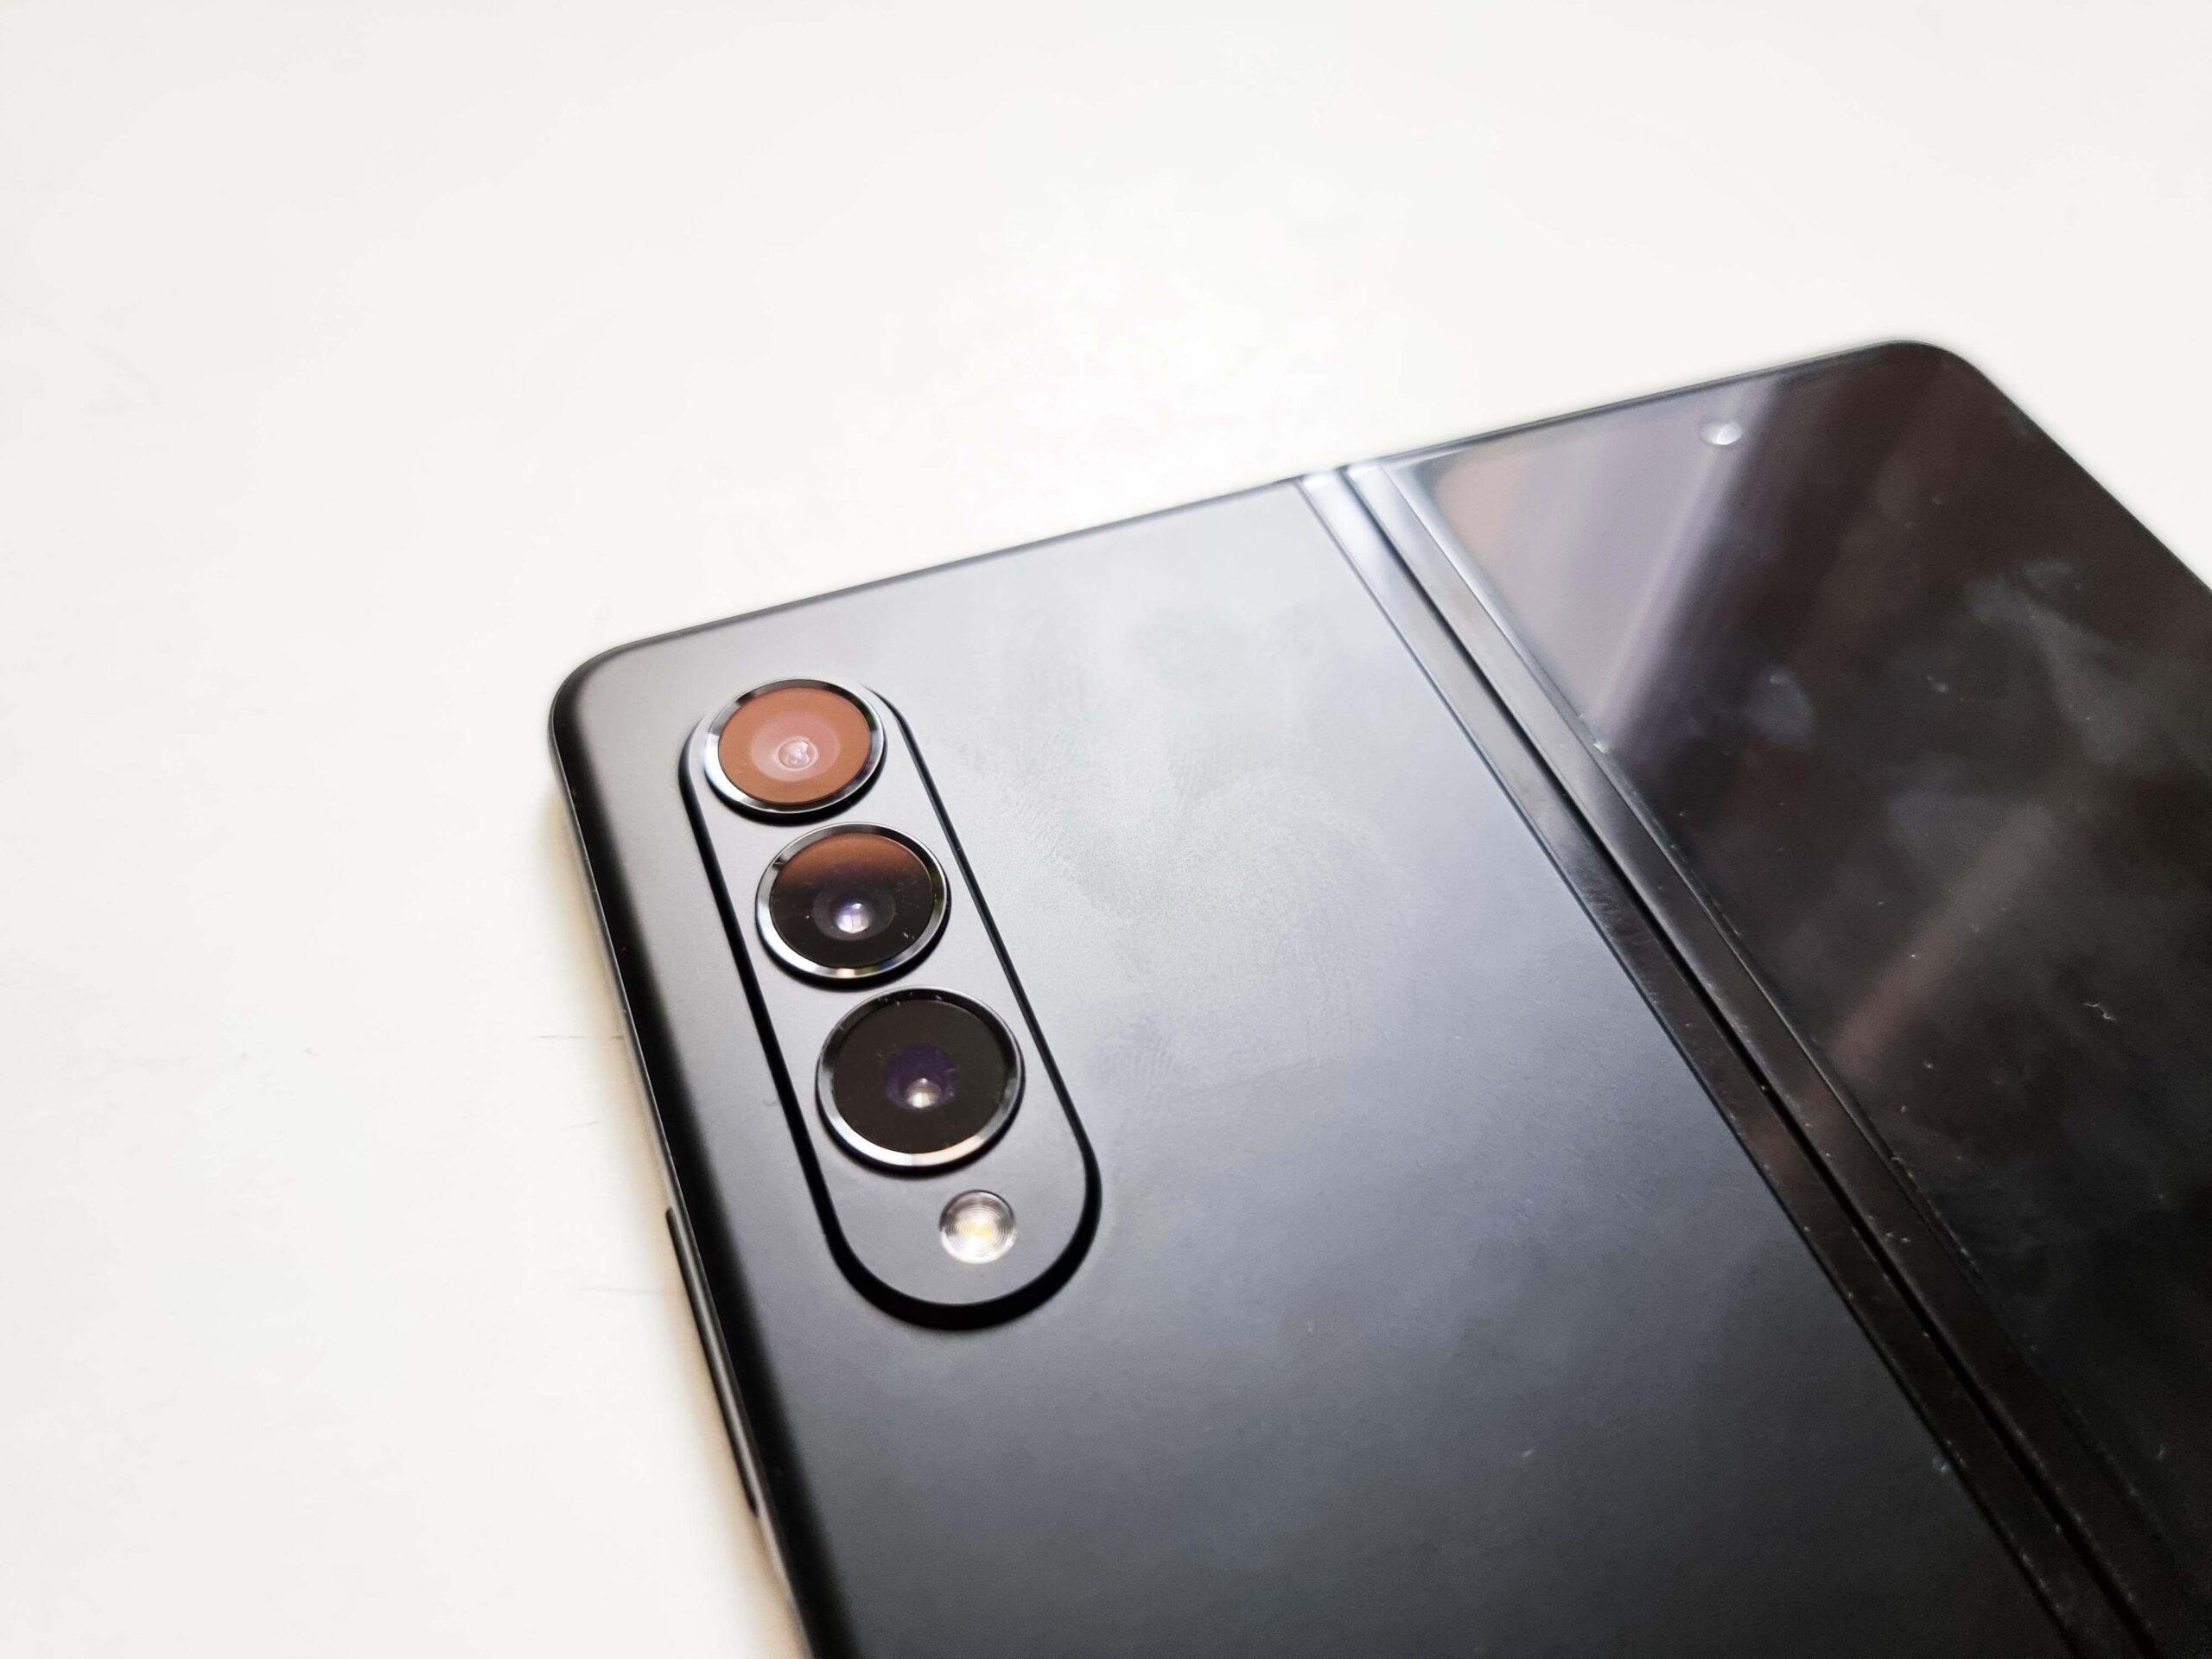 Tot ce trebuie sa stii despre telefoanele pliabile Samsung Galaxy Z Fold3 si Z Flip3 - 5